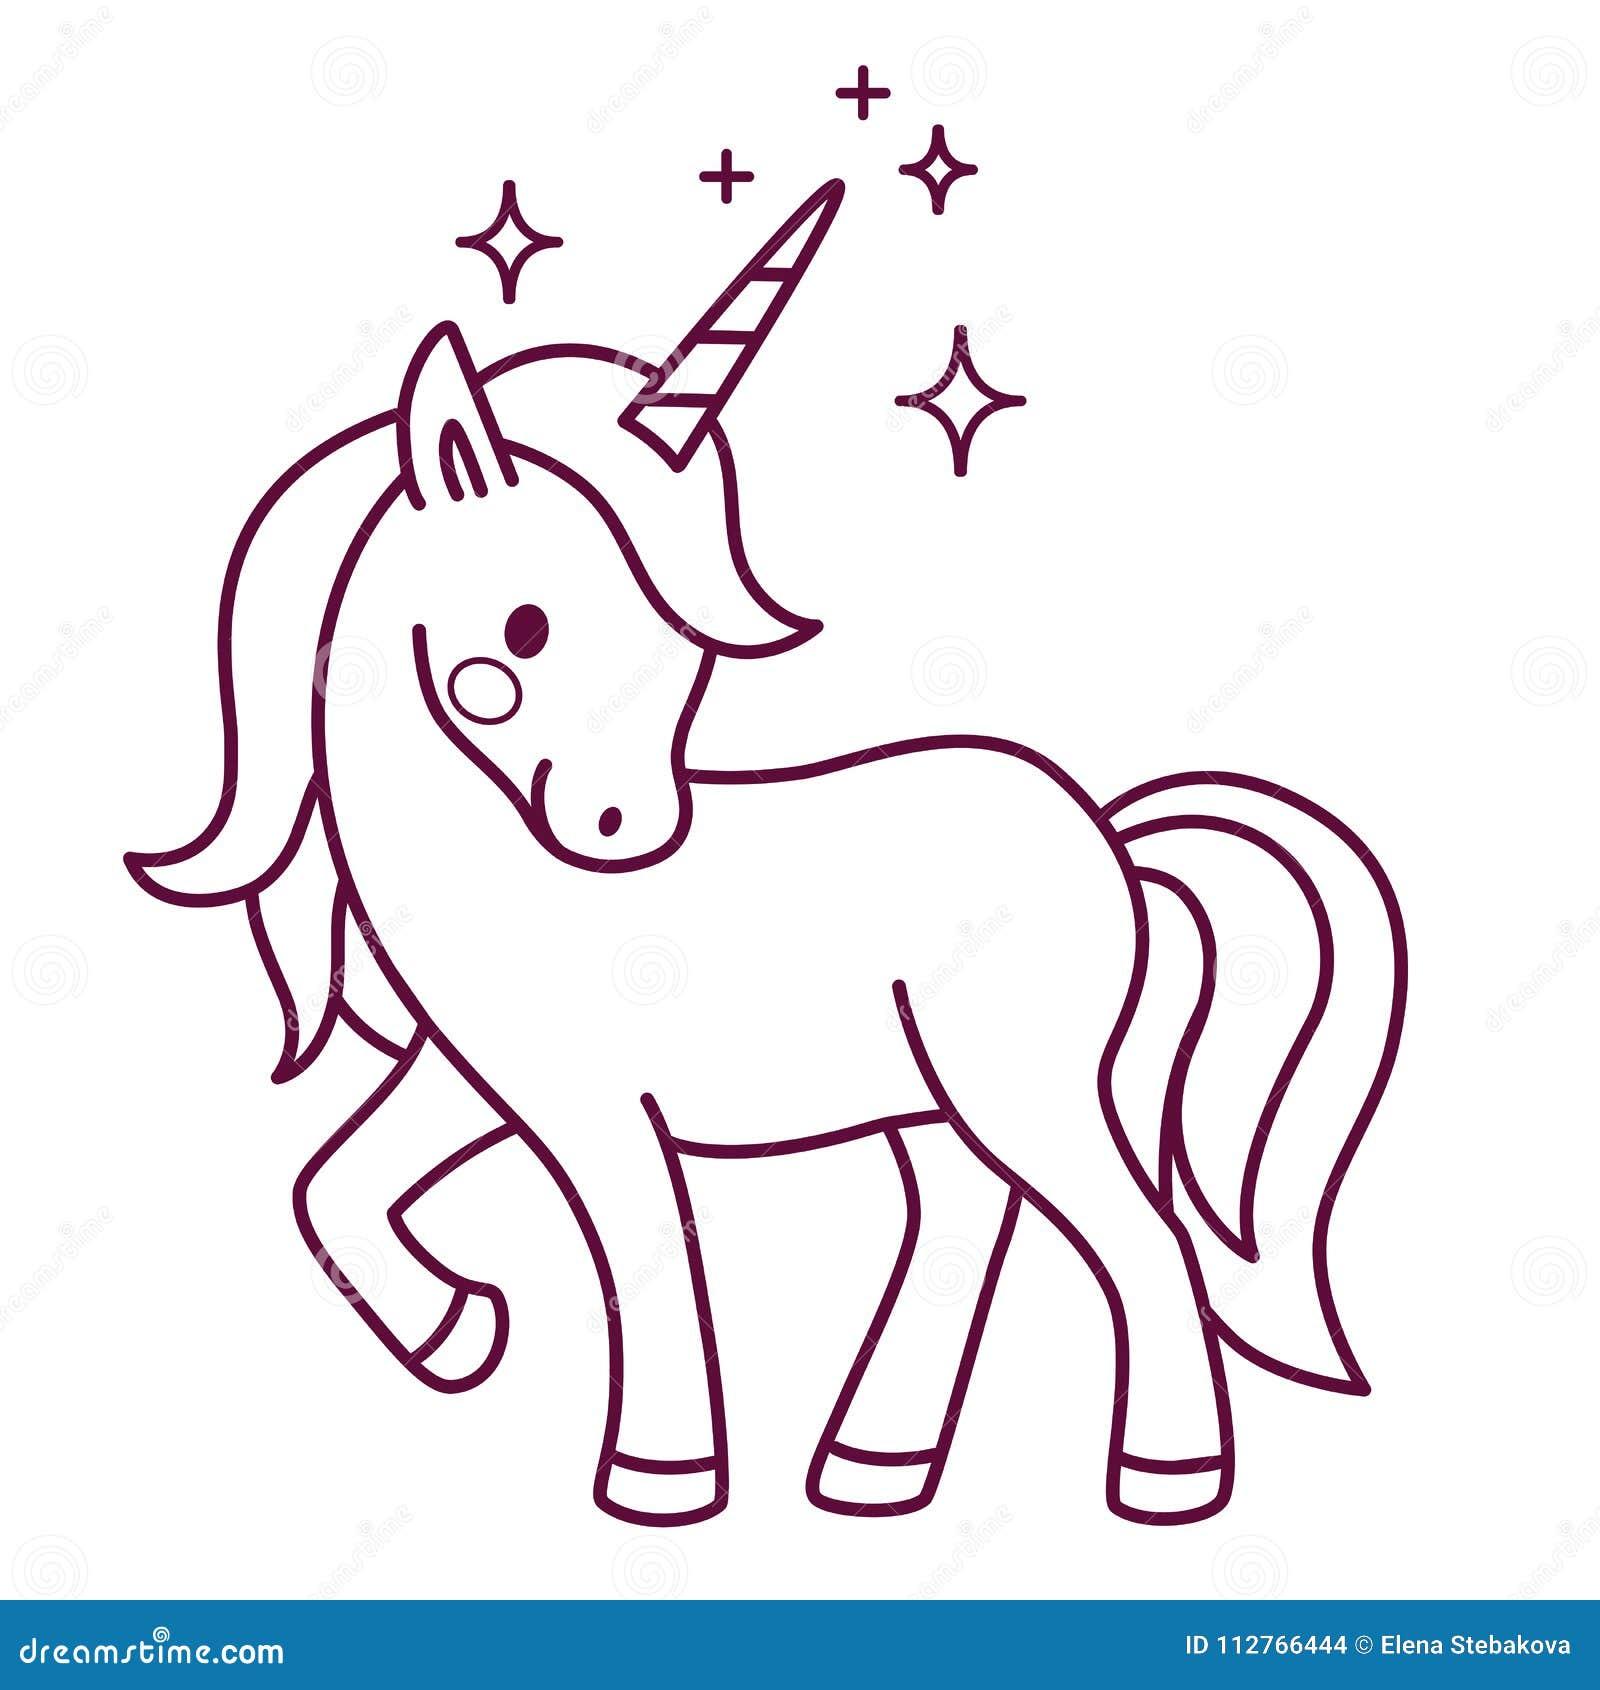 Unicorni Kawaii Da Colorare Per Fantasia Gratis Per Unicorno Kawaii